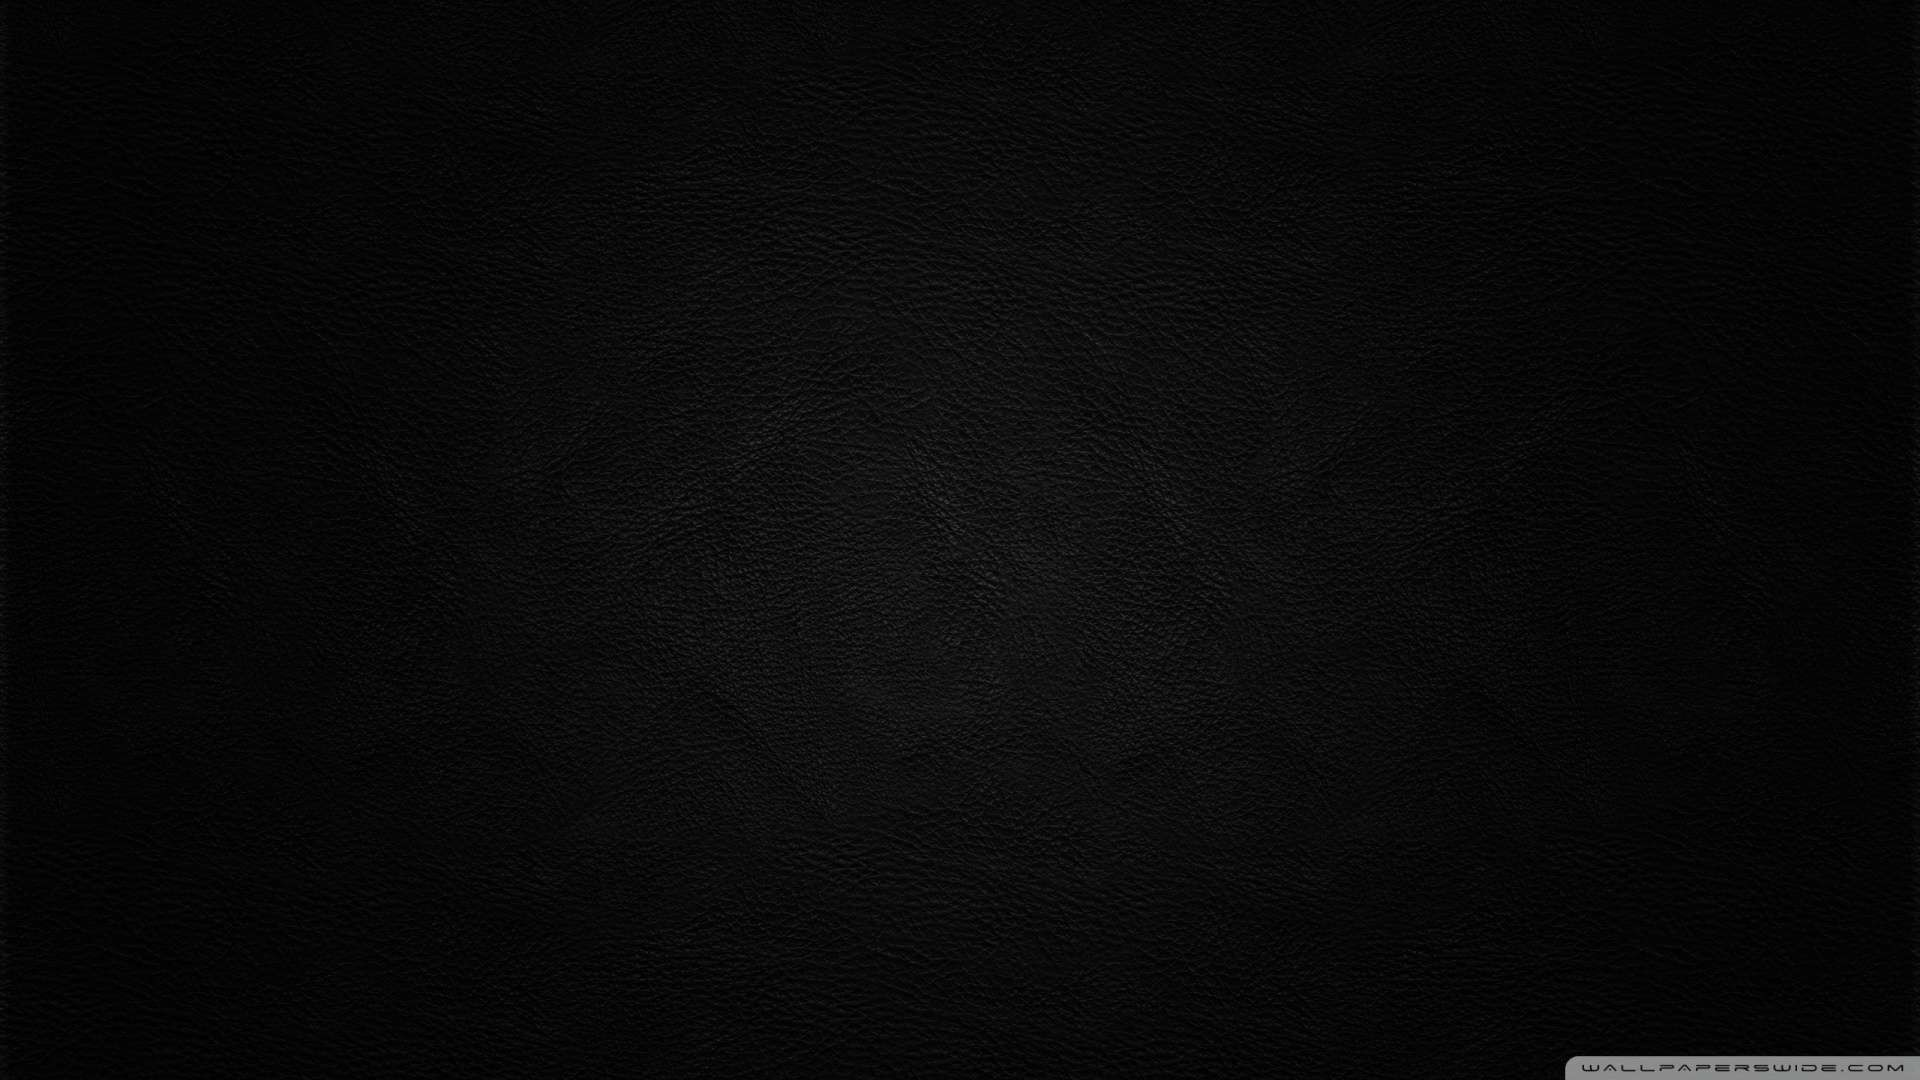 Black Theme Wallpaper 1080p 70 Images